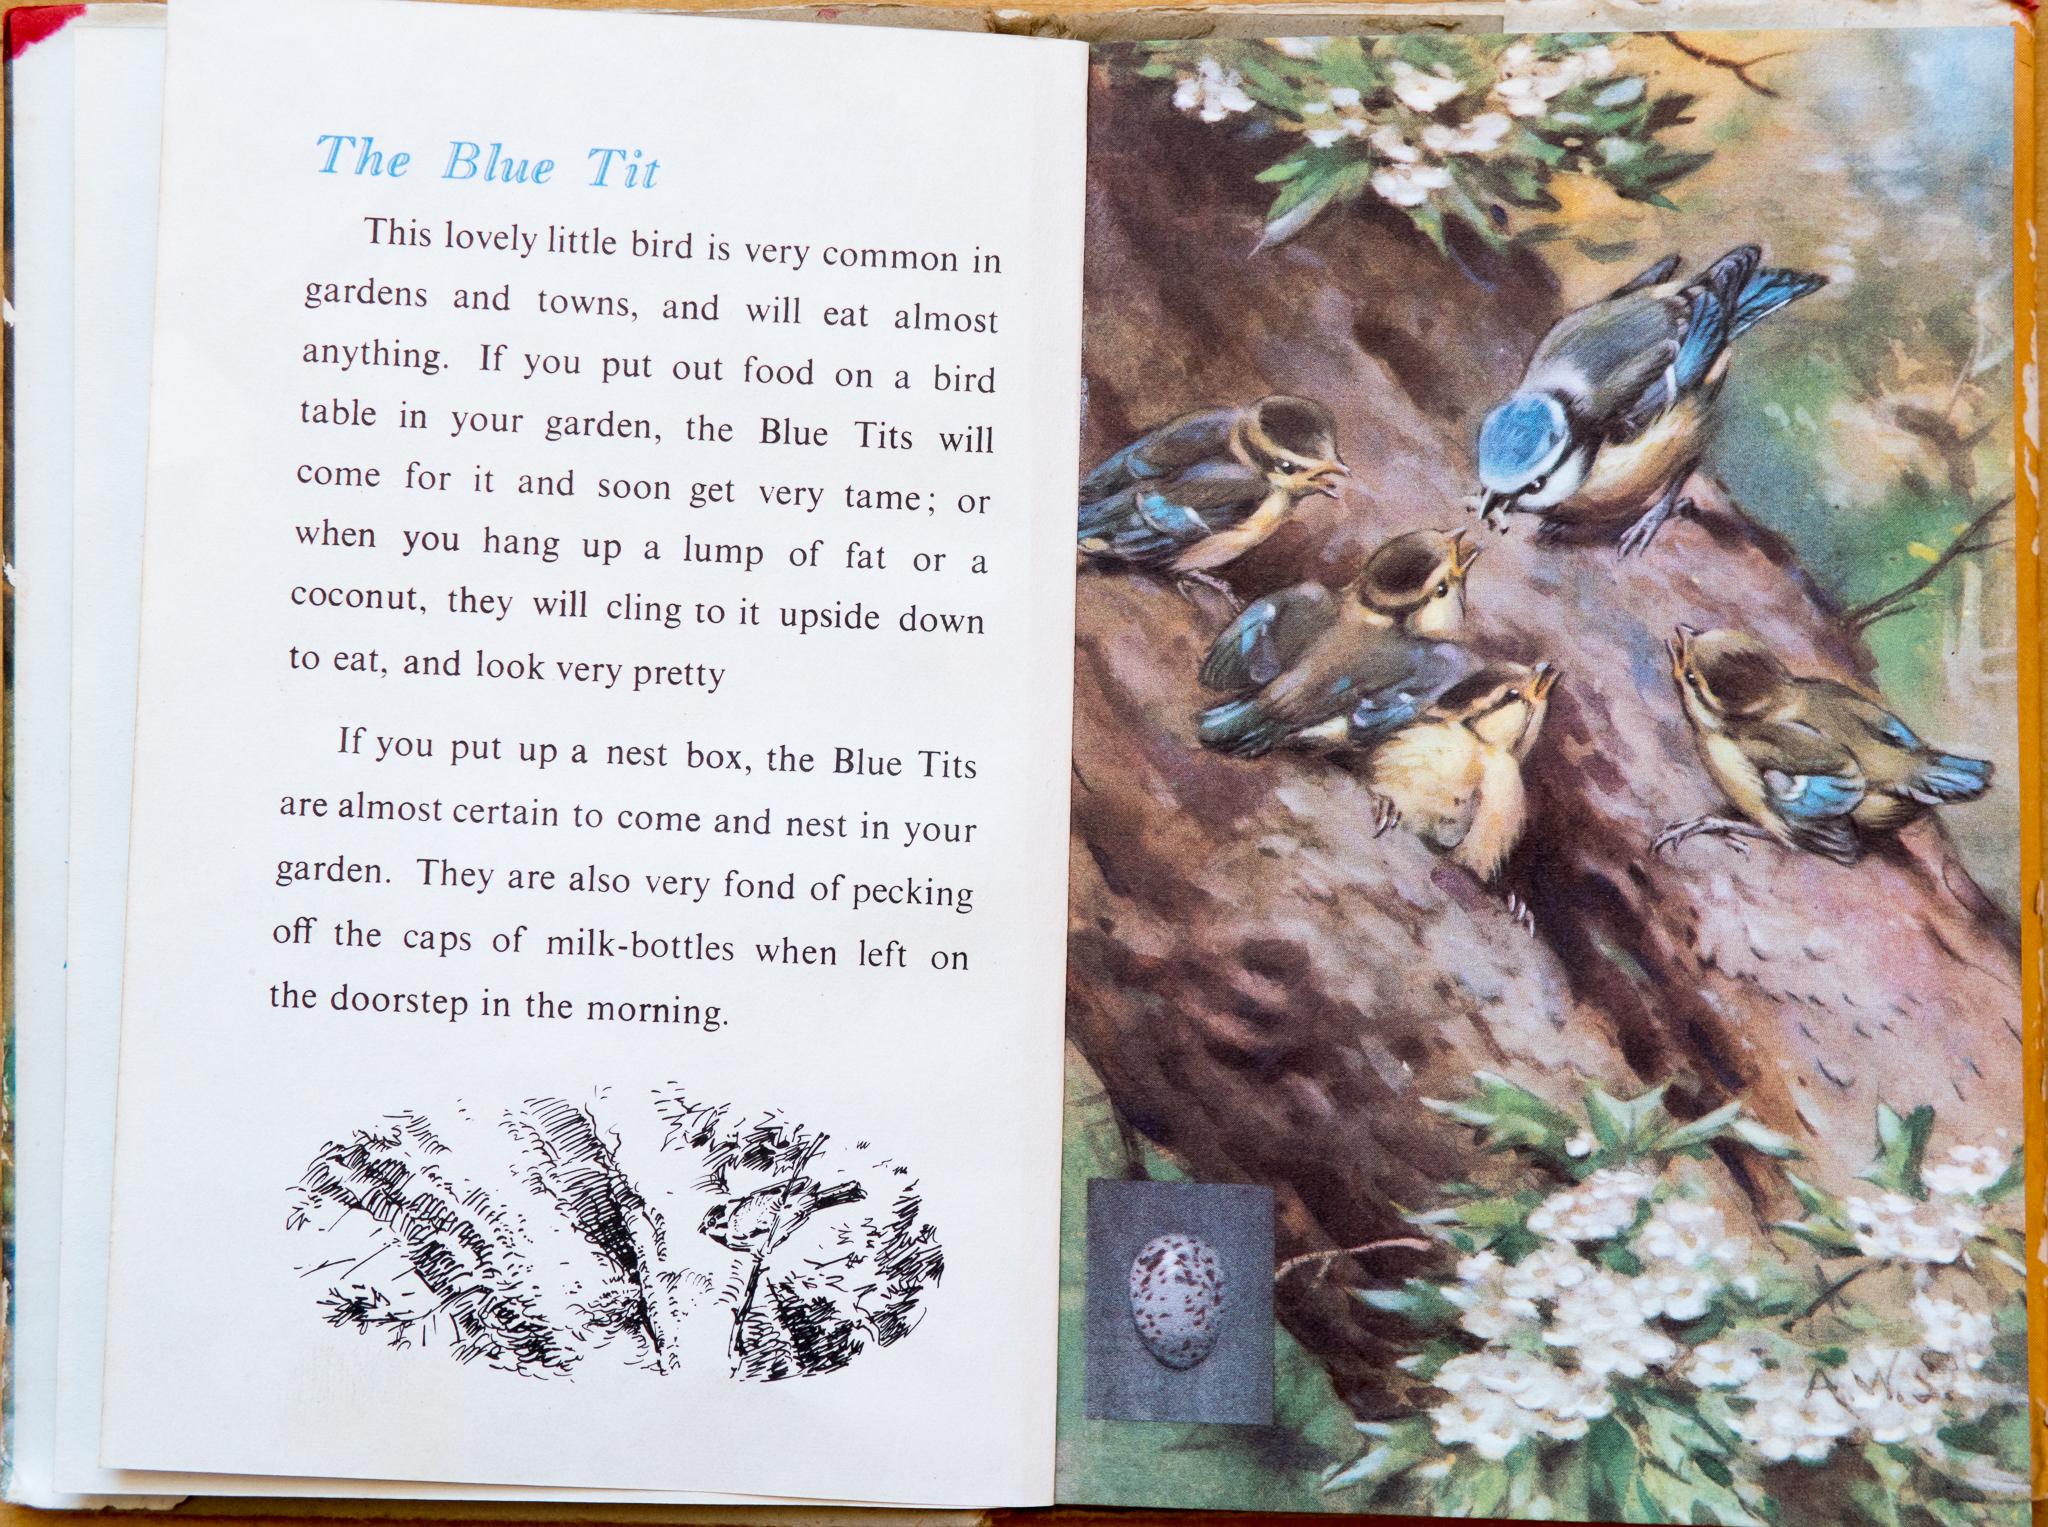 The Blue Tit - Ladybird Book of British Birds - The Hall of Einar